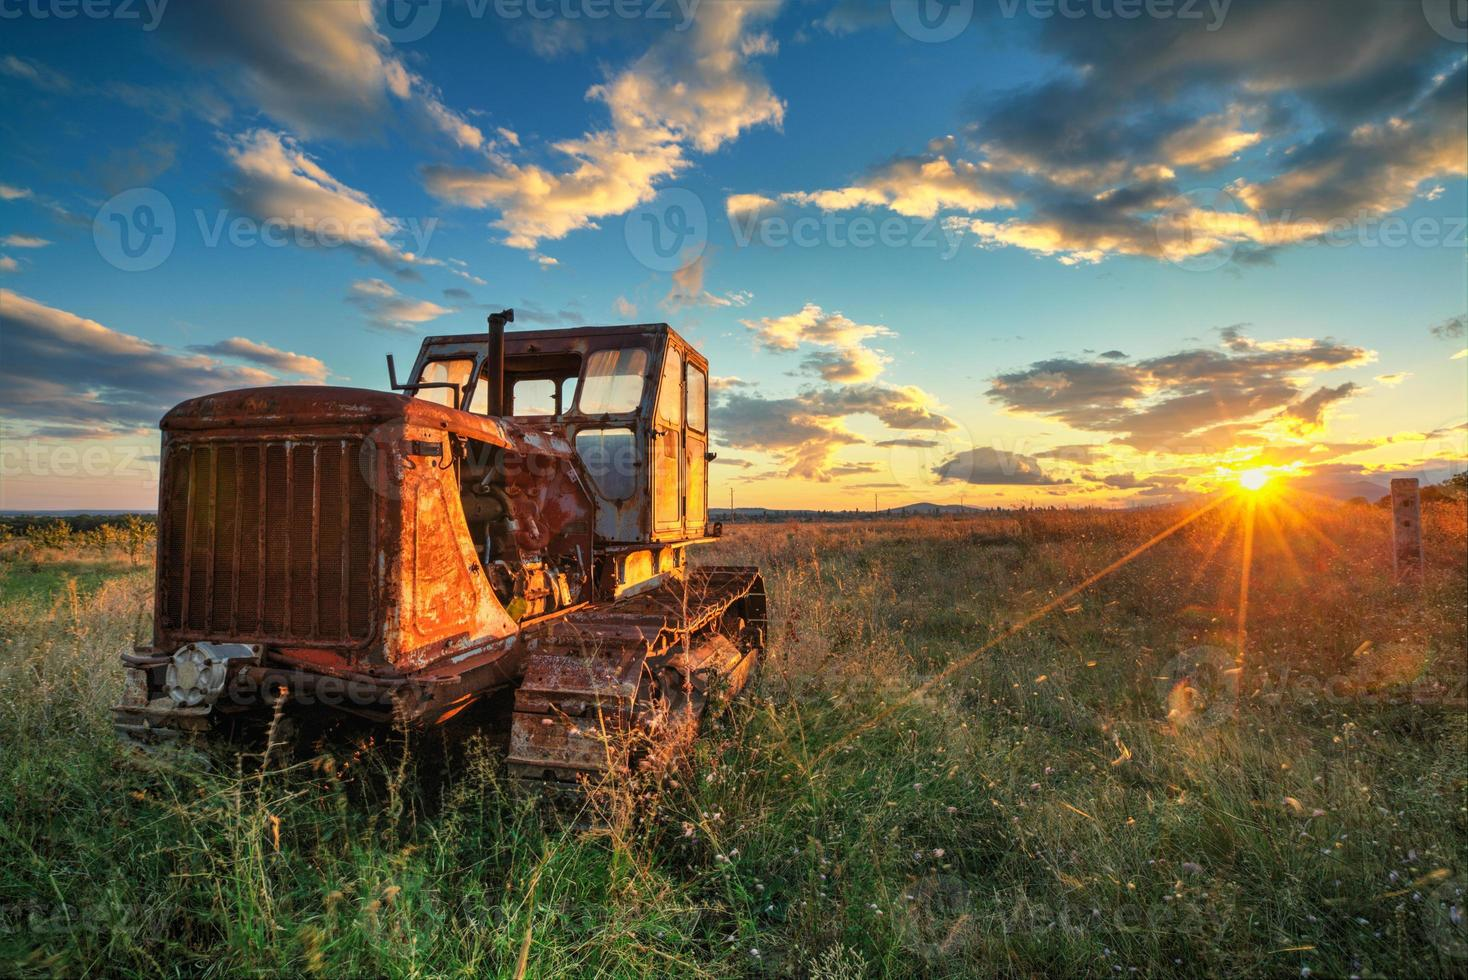 alter rostiger Traktor in einem Feld auf Sonnenuntergang foto